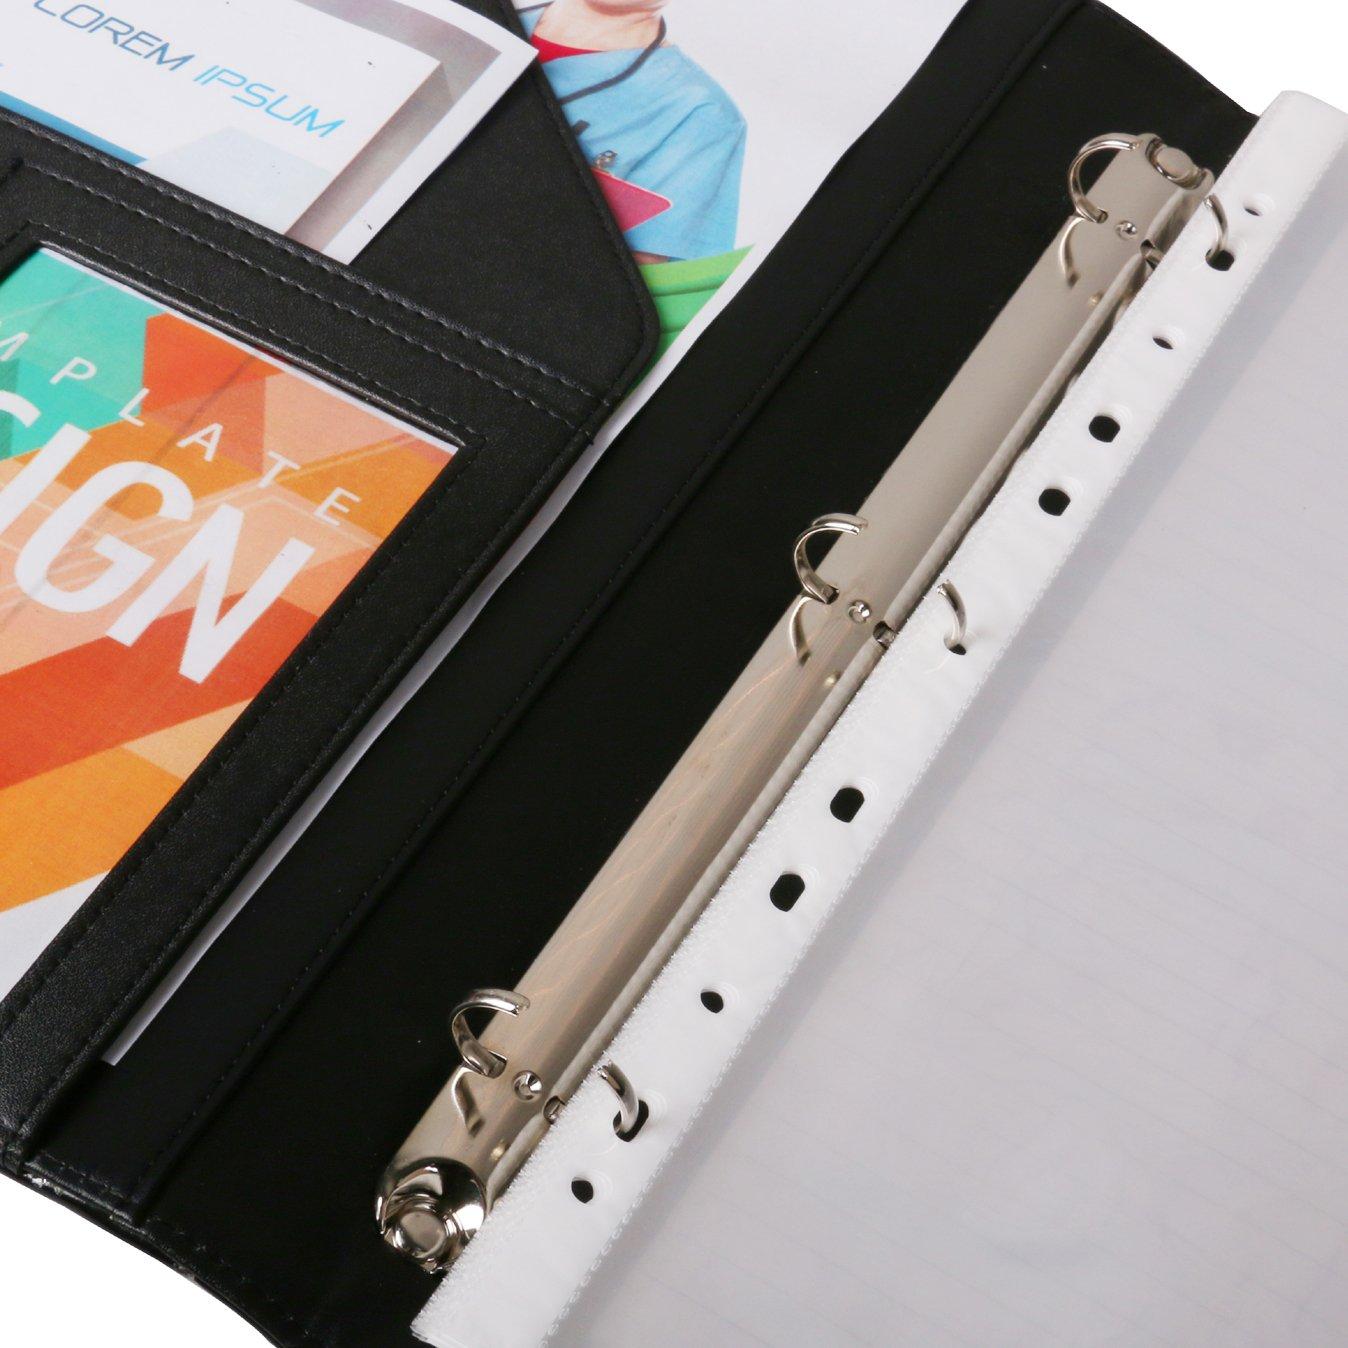 Z PLINRISE Luxury Marble Portfolio File Folder Document Resume Organizer,Padfolio File Holder Folders Letter Size,Standard 3 Ring Binder with Clipboard (Marble Black) by Z PLINRISE (Image #5)